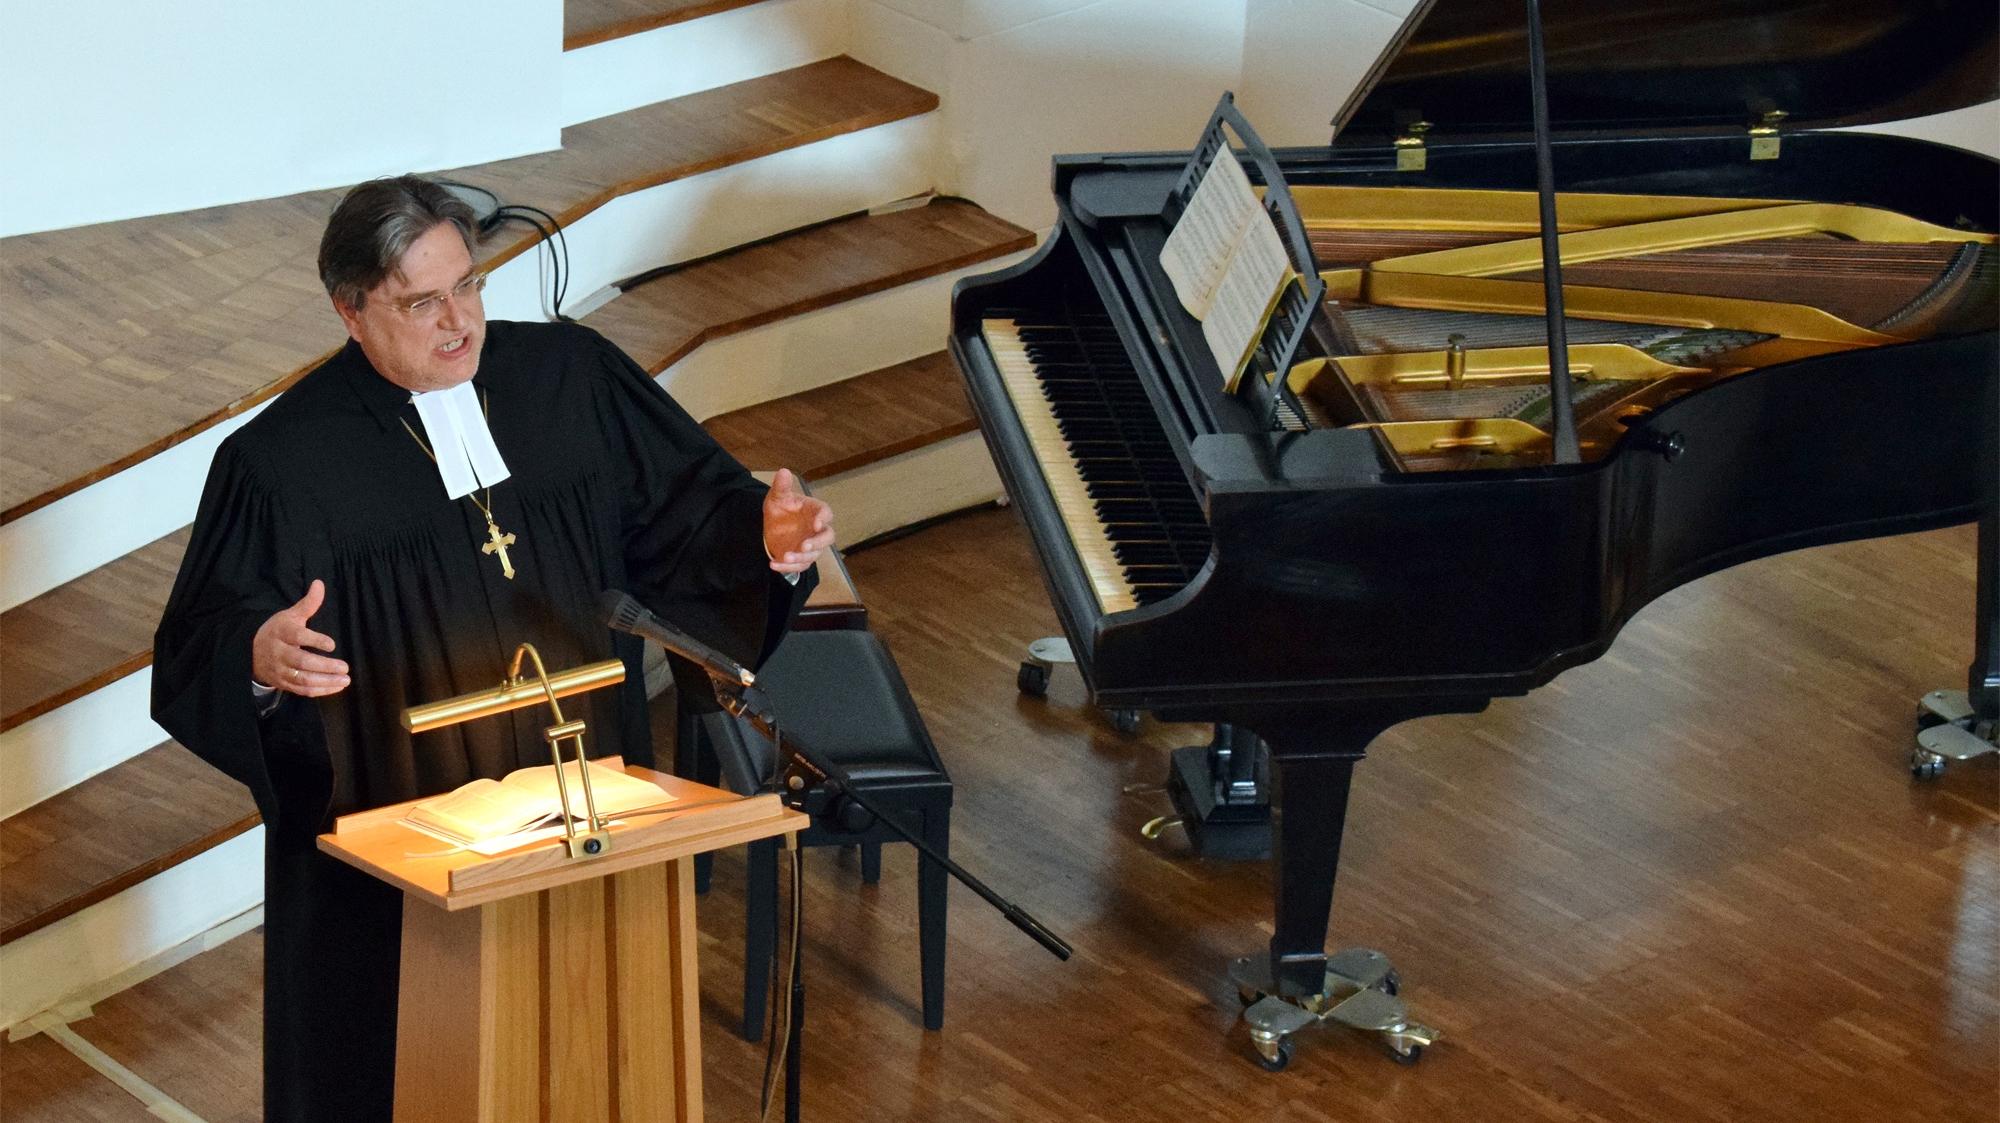 Kirchenpräsident Joachim Liebig während der Predigt (Urheber © Kanzlerstiftung)